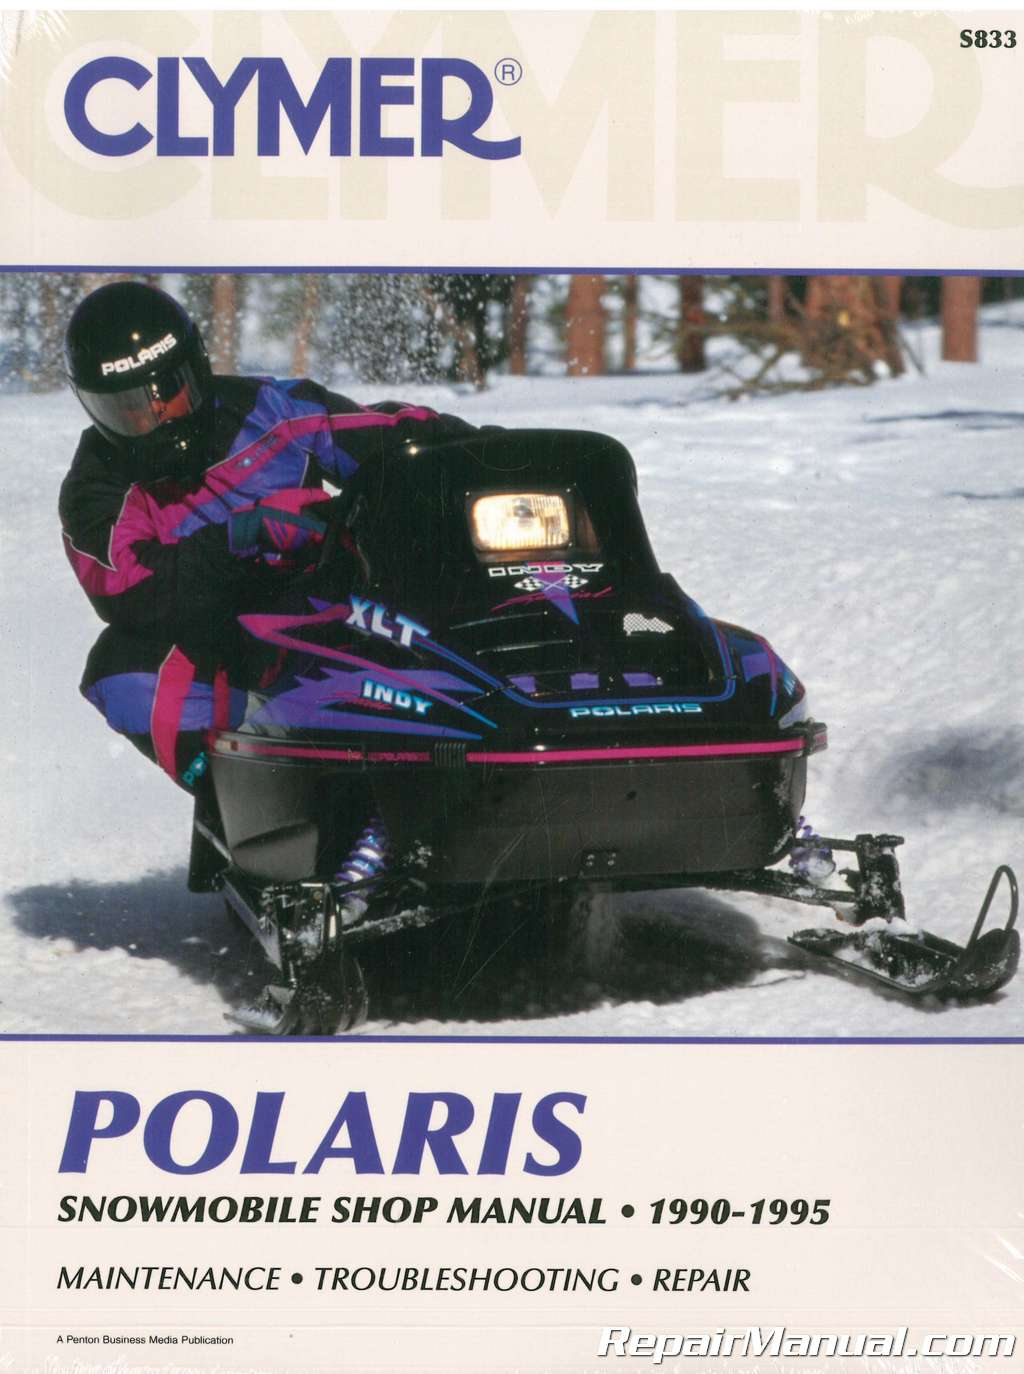 1990-1995 SKS RXL XLT GT 400 500 650 Clymer Polaris Snowmobile Service  Manual